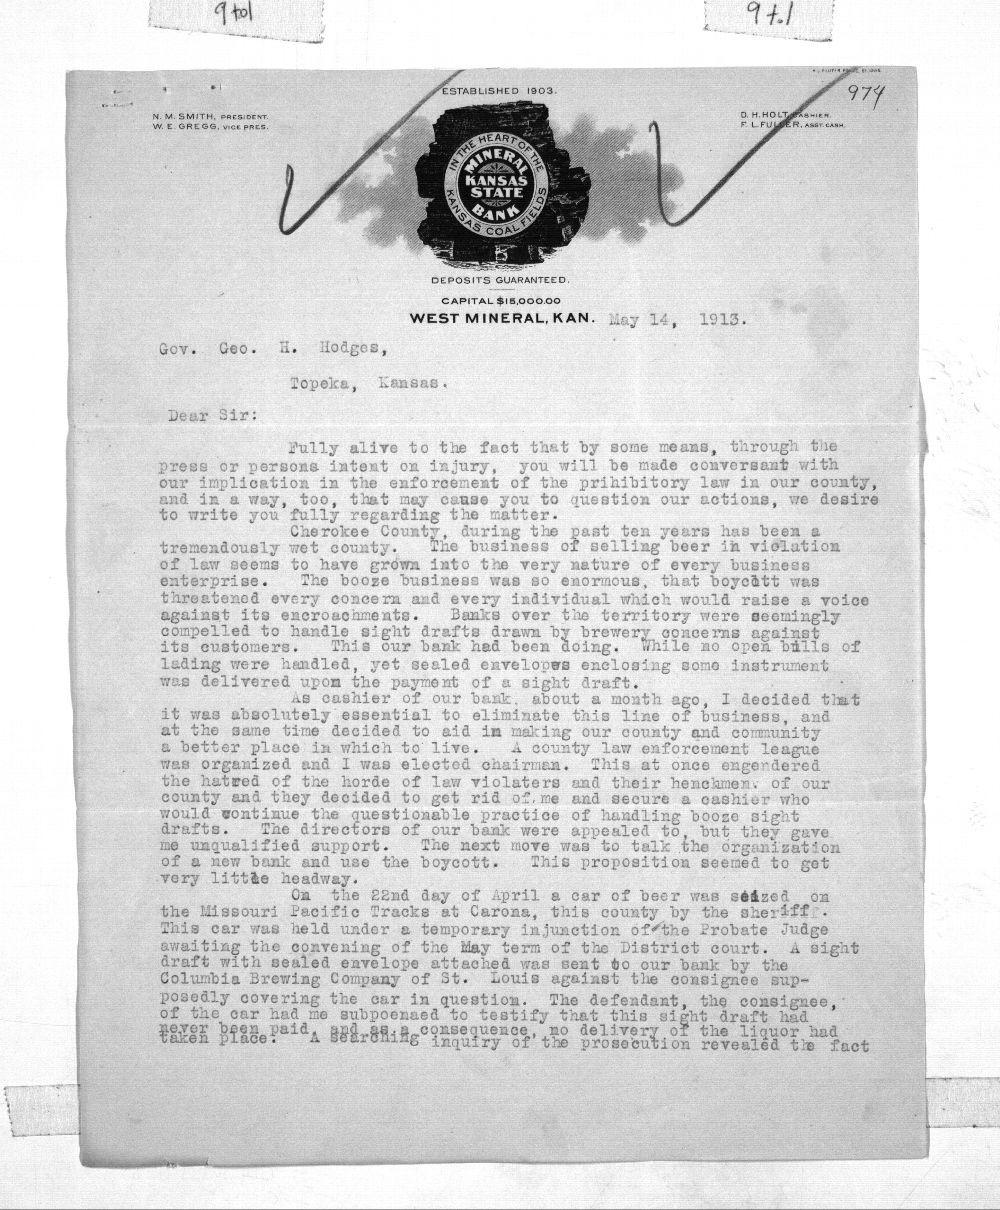 D. H. Holt to Governor George Hartshorn Hodges - 1